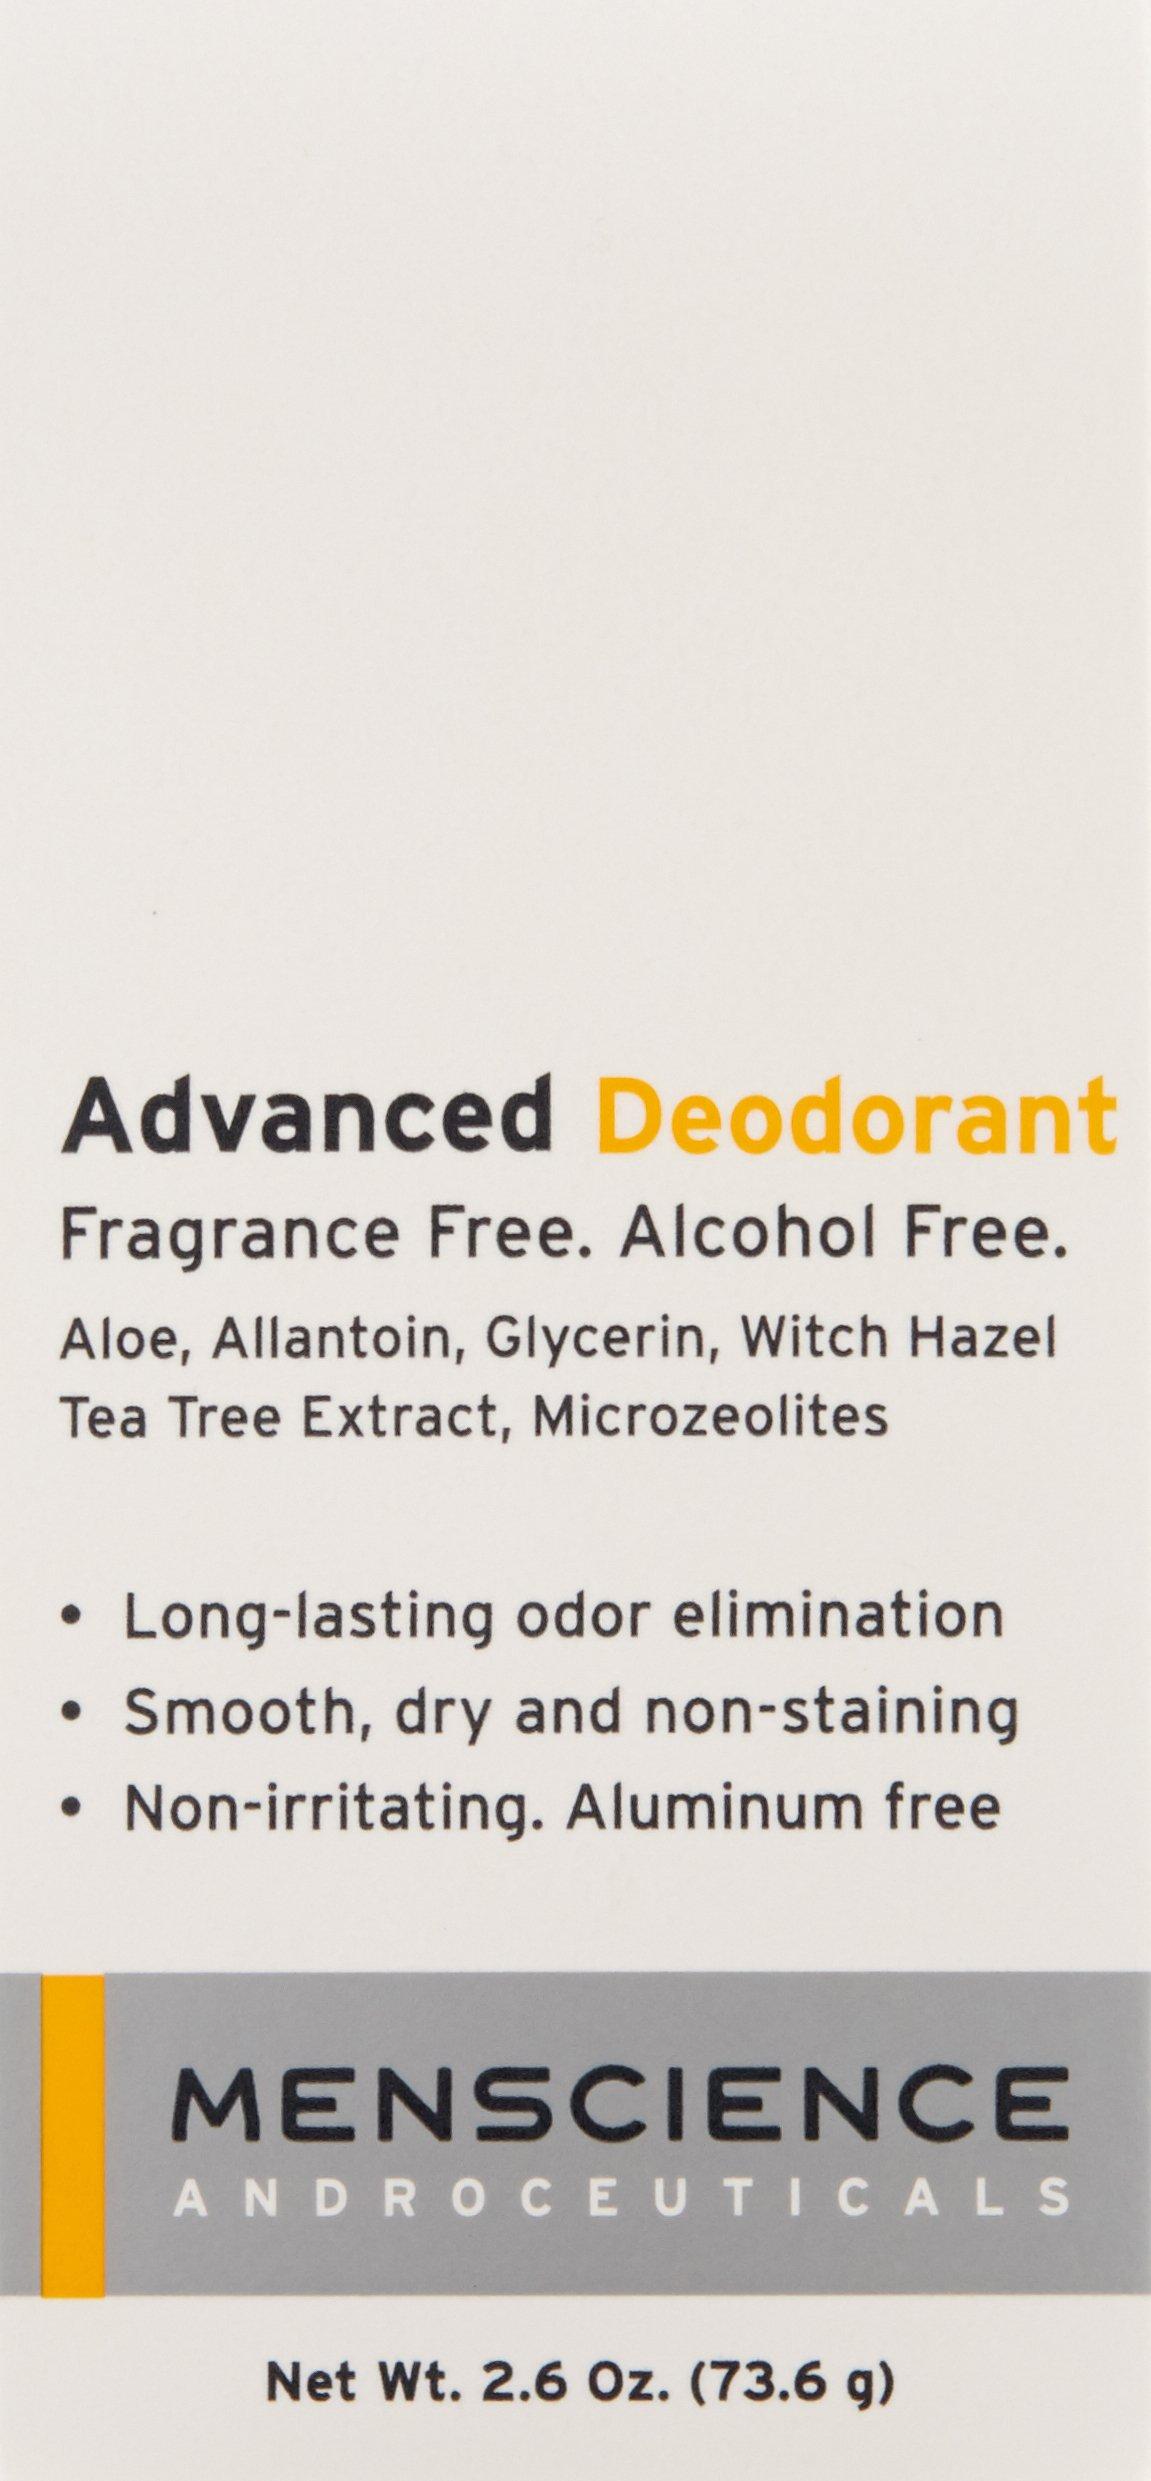 MenScience Androceuticals Advanced Deodorant, 2.6 oz. by MenScience Androceuticals (Image #3)